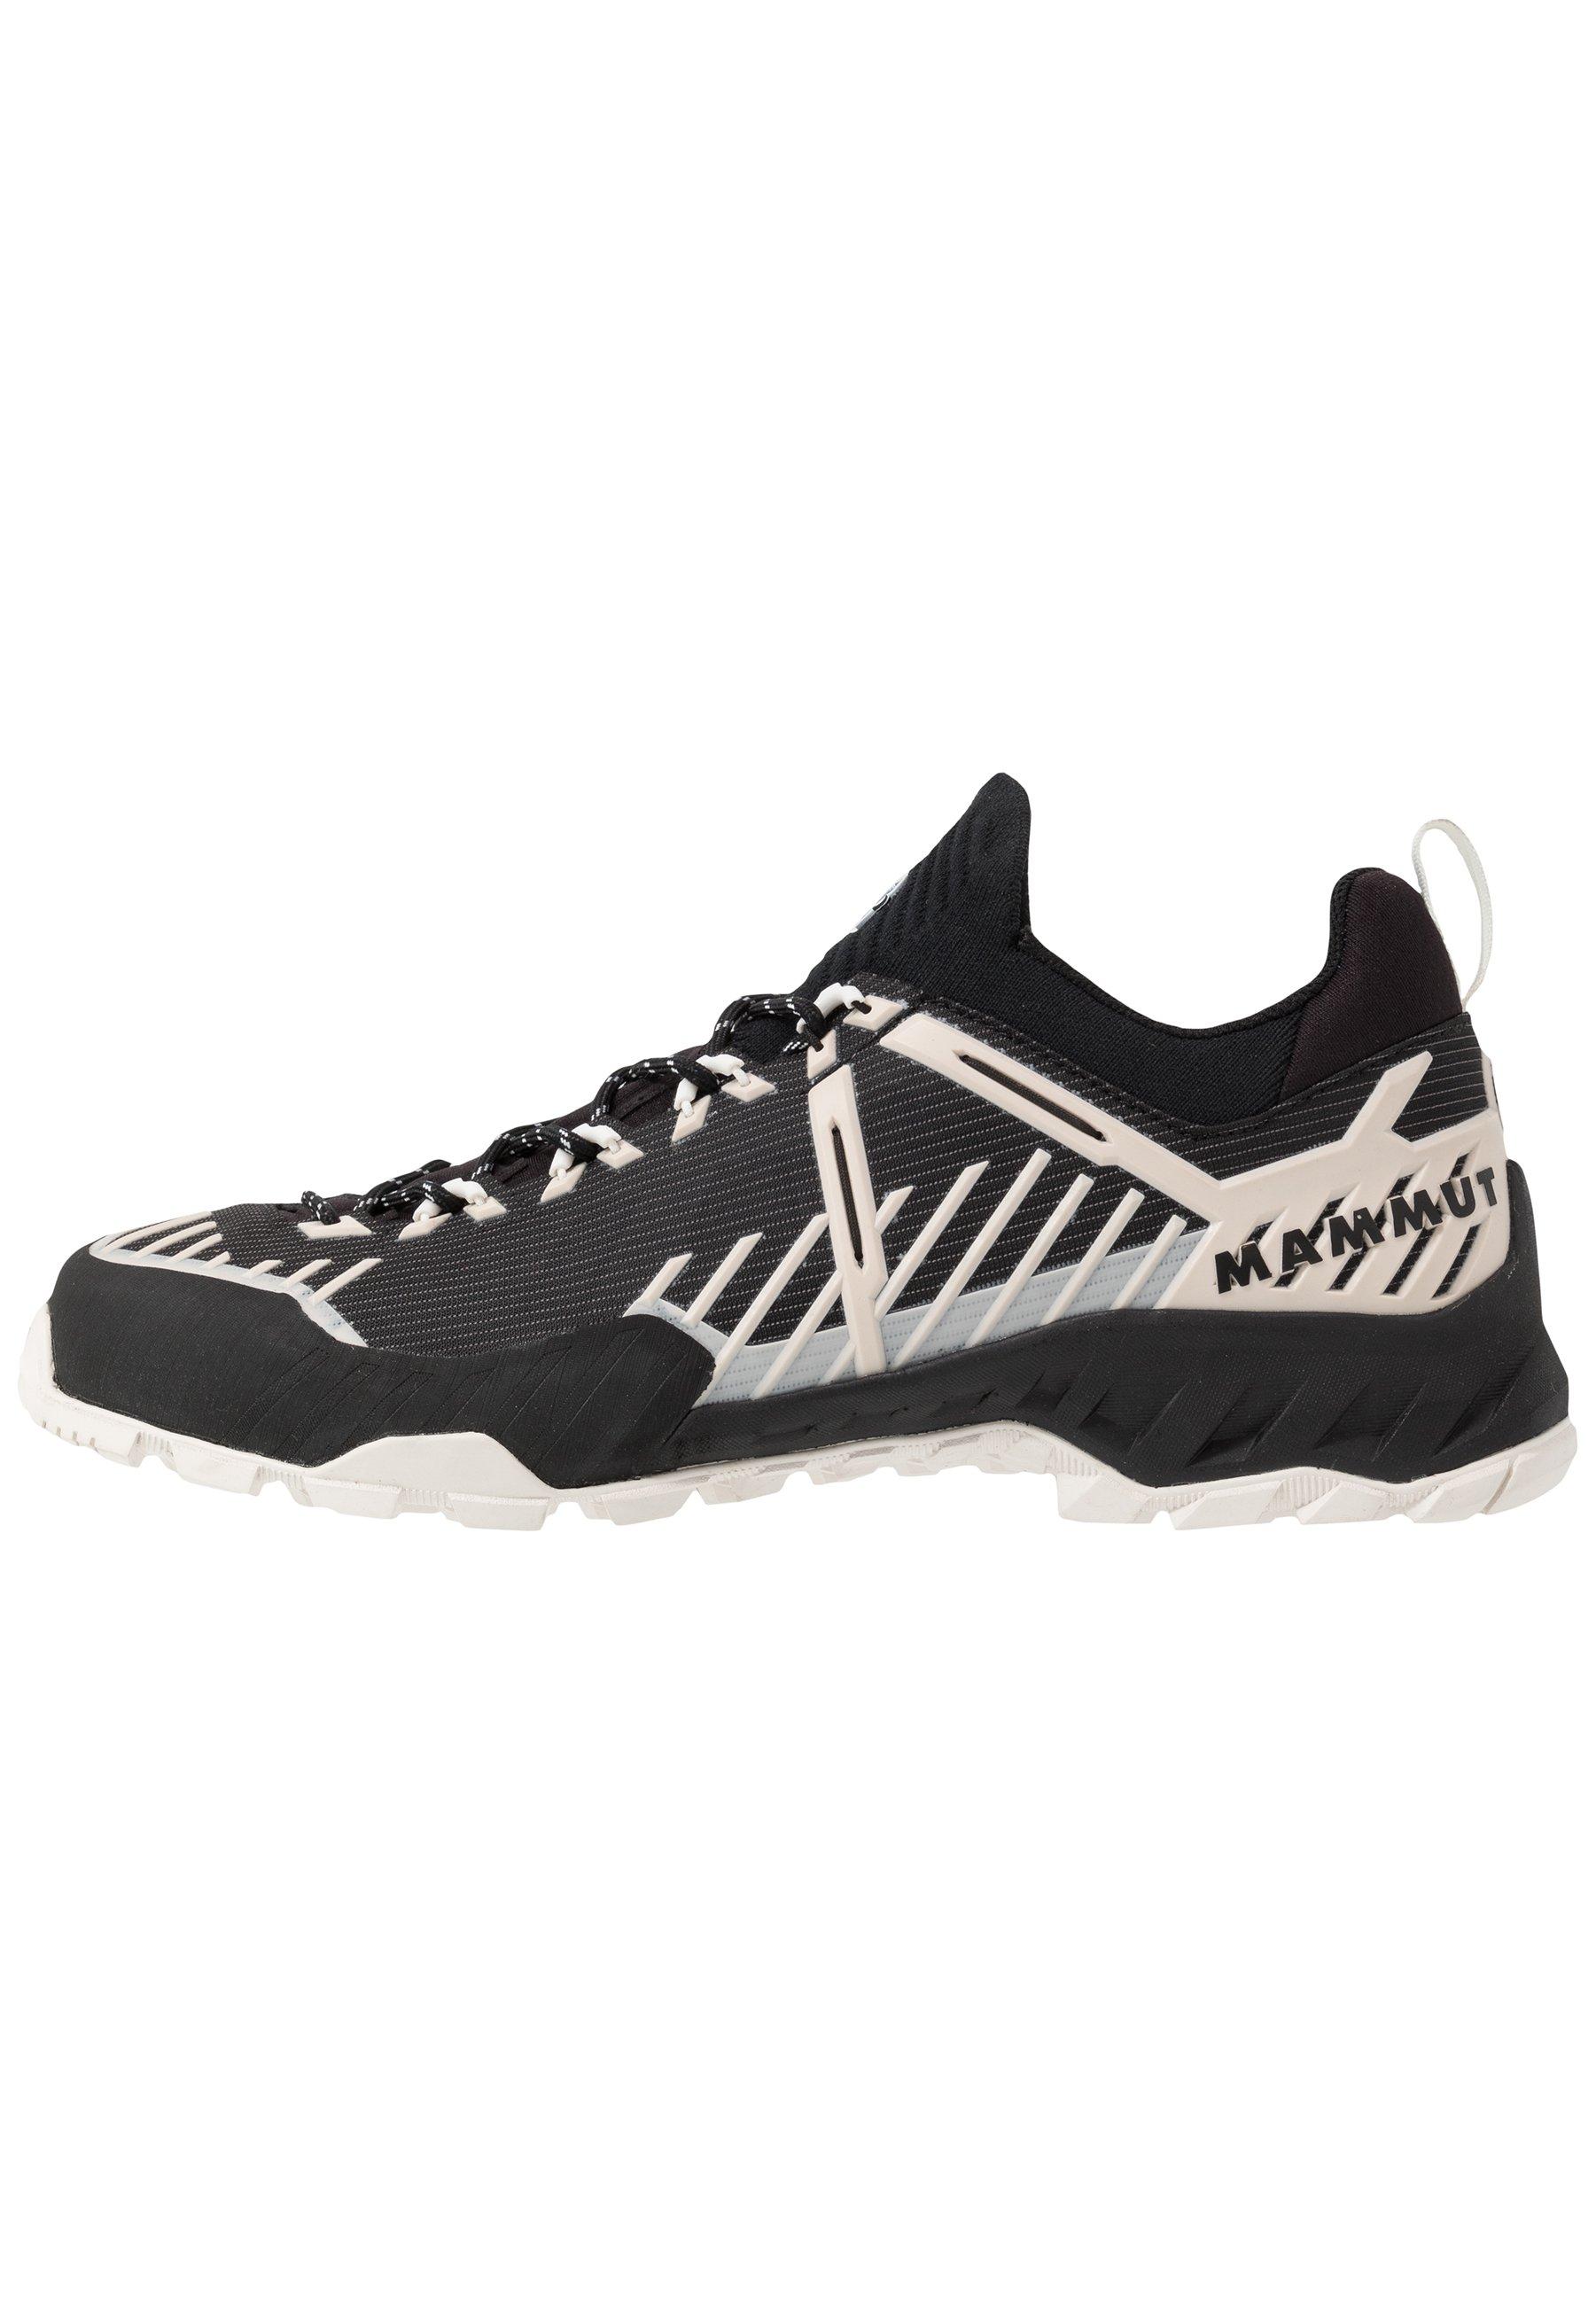 ALNASCA II LOW MEN Chaussures de marche blackbright white